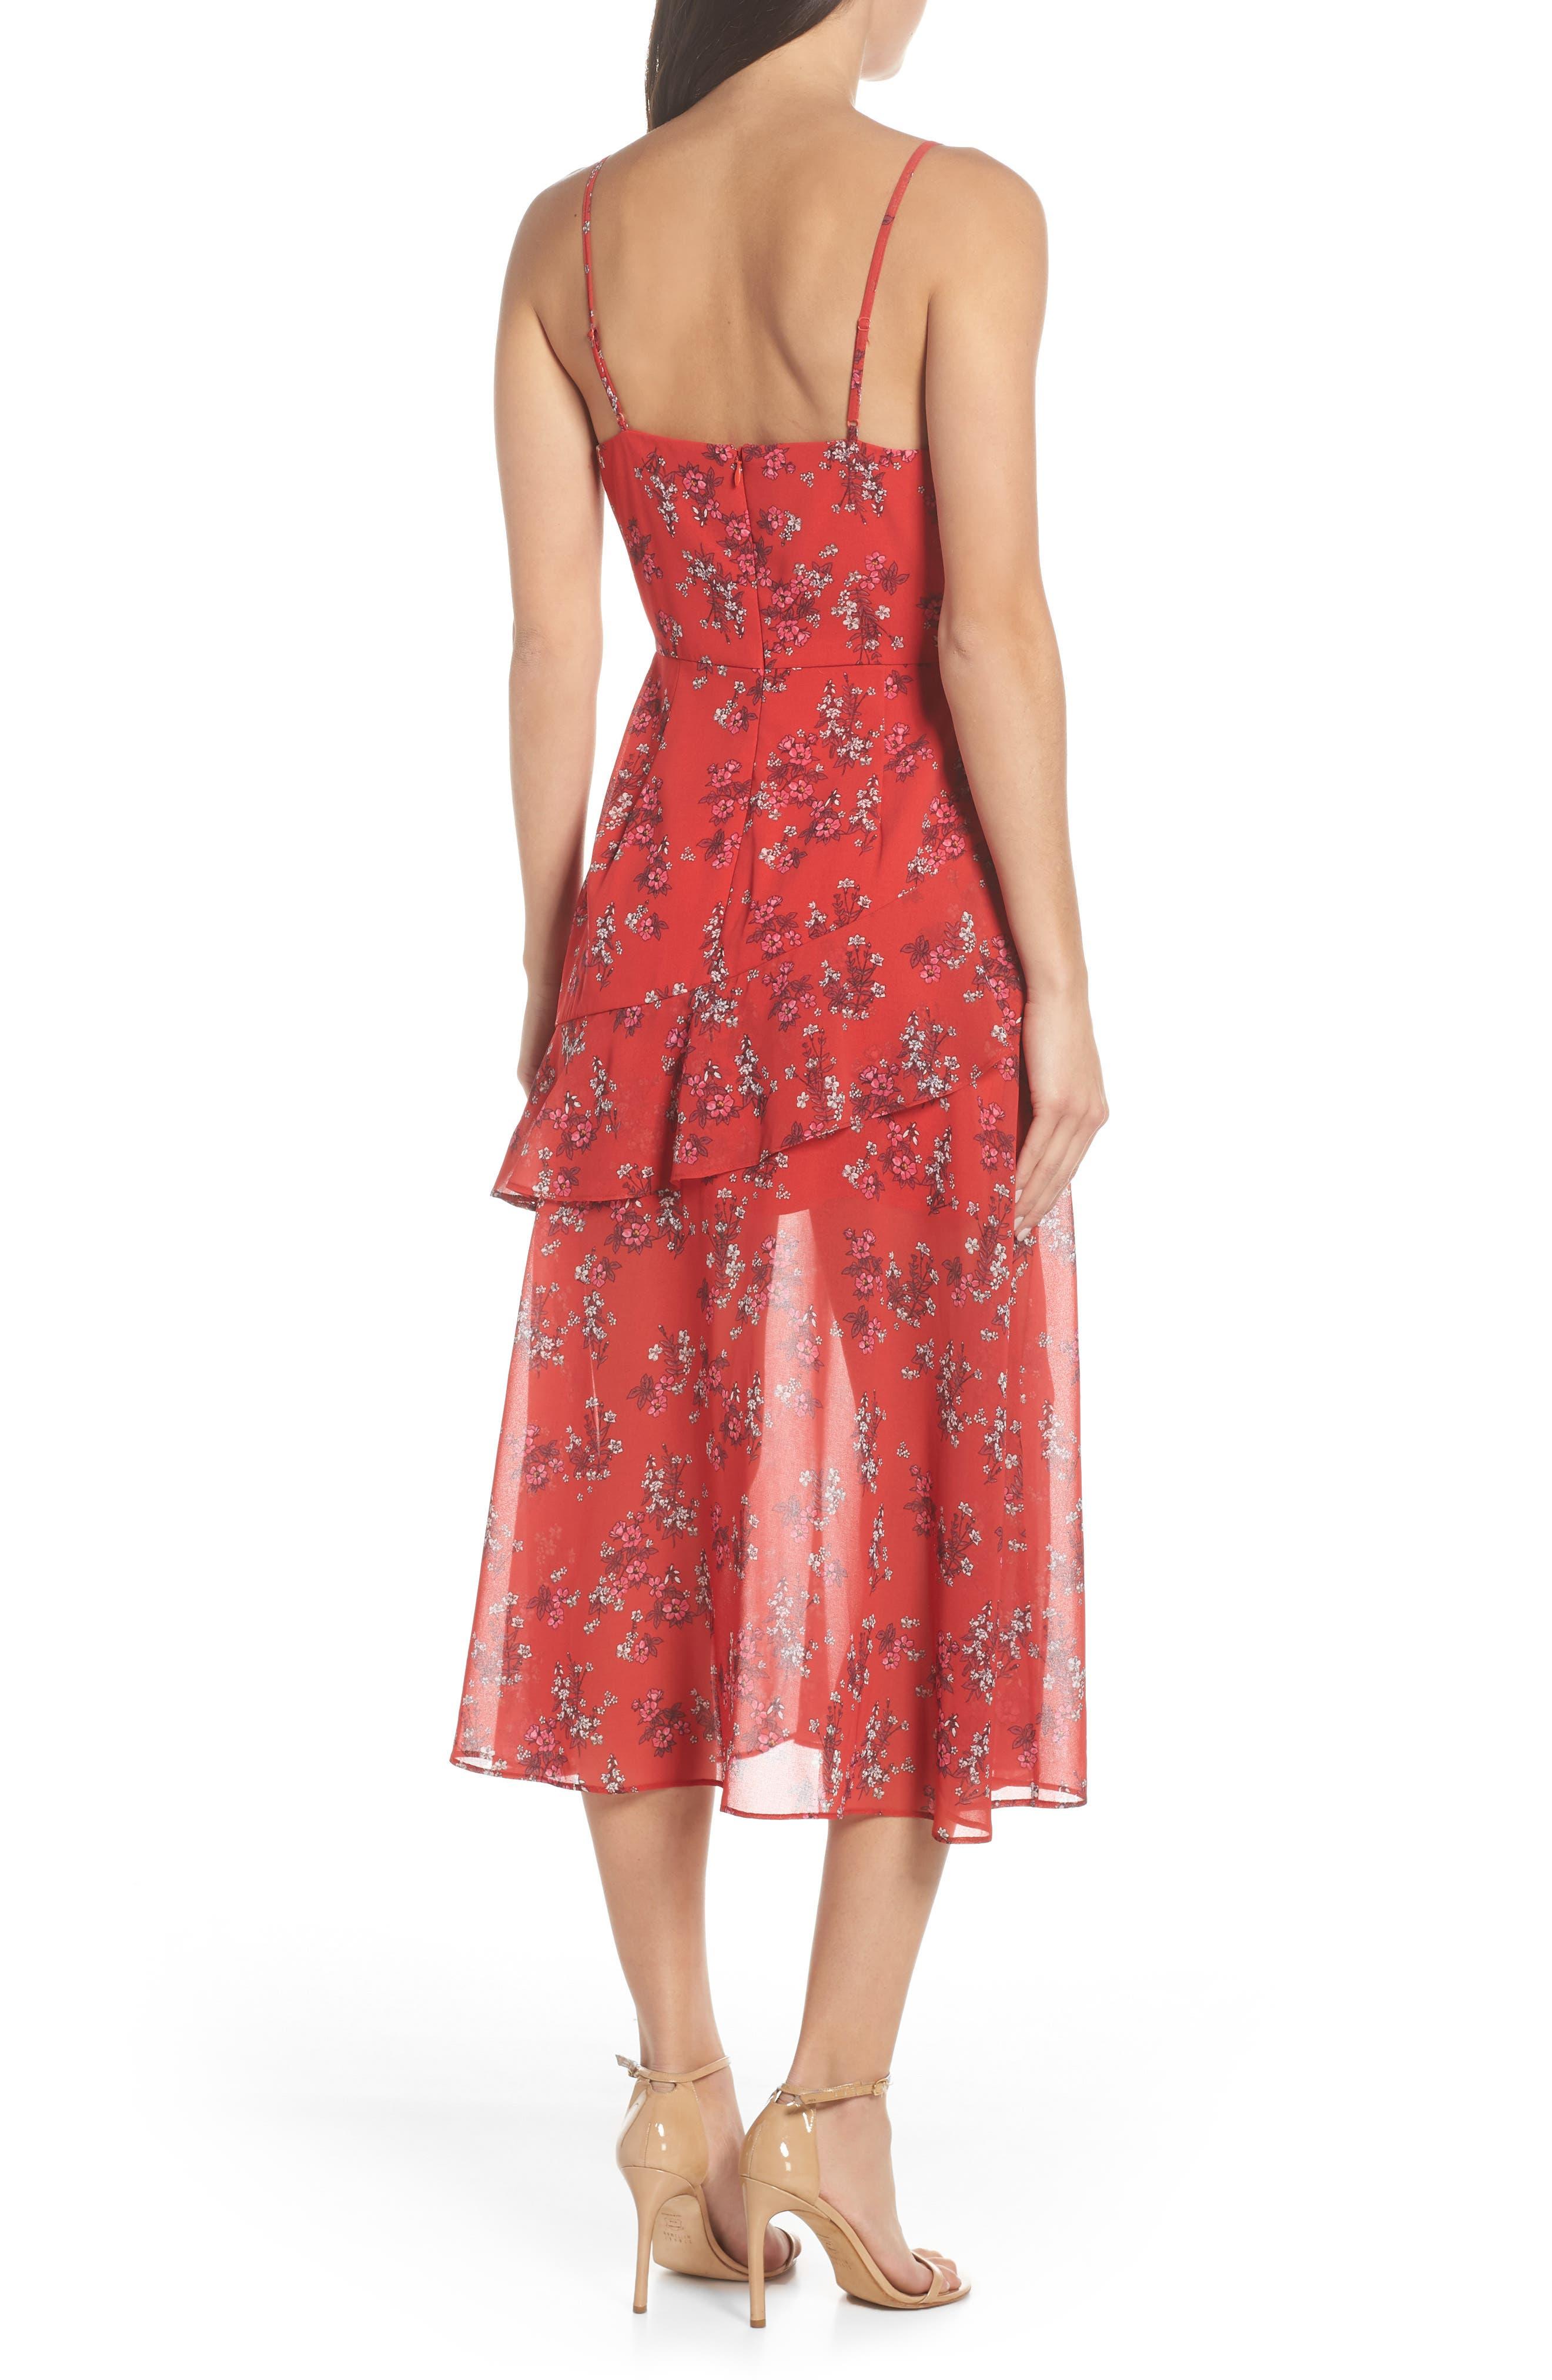 KEEPSAKE THE LABEL,                             Heart & Soul Ruffle Detail Tea Length Dress,                             Alternate thumbnail 2, color,                             SMALL RED FLORAL